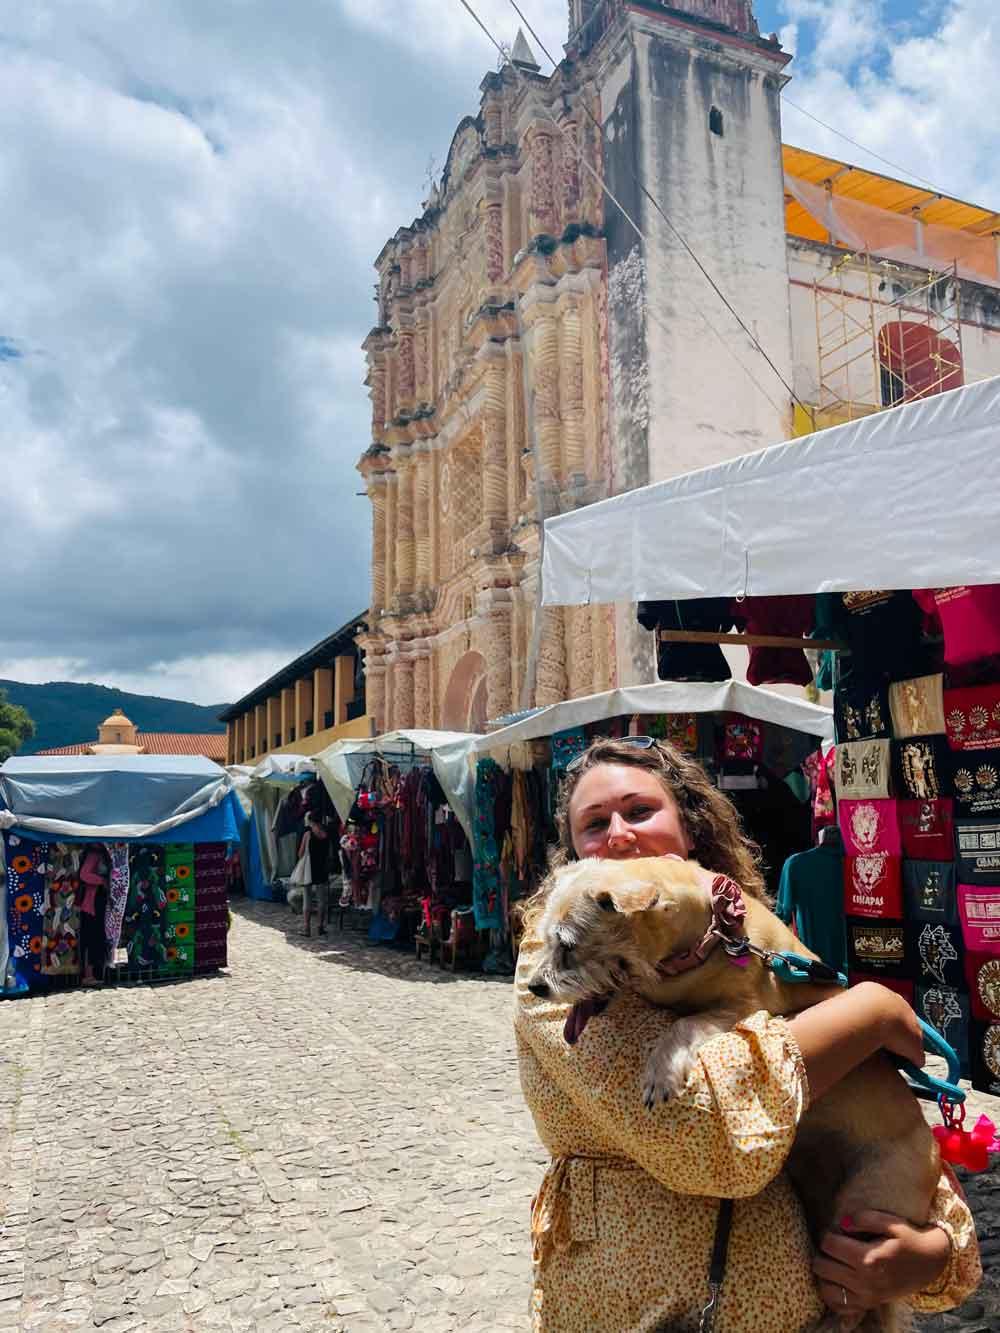 Belle was tired after exploring the markets in San Cristobol de Las Casas.